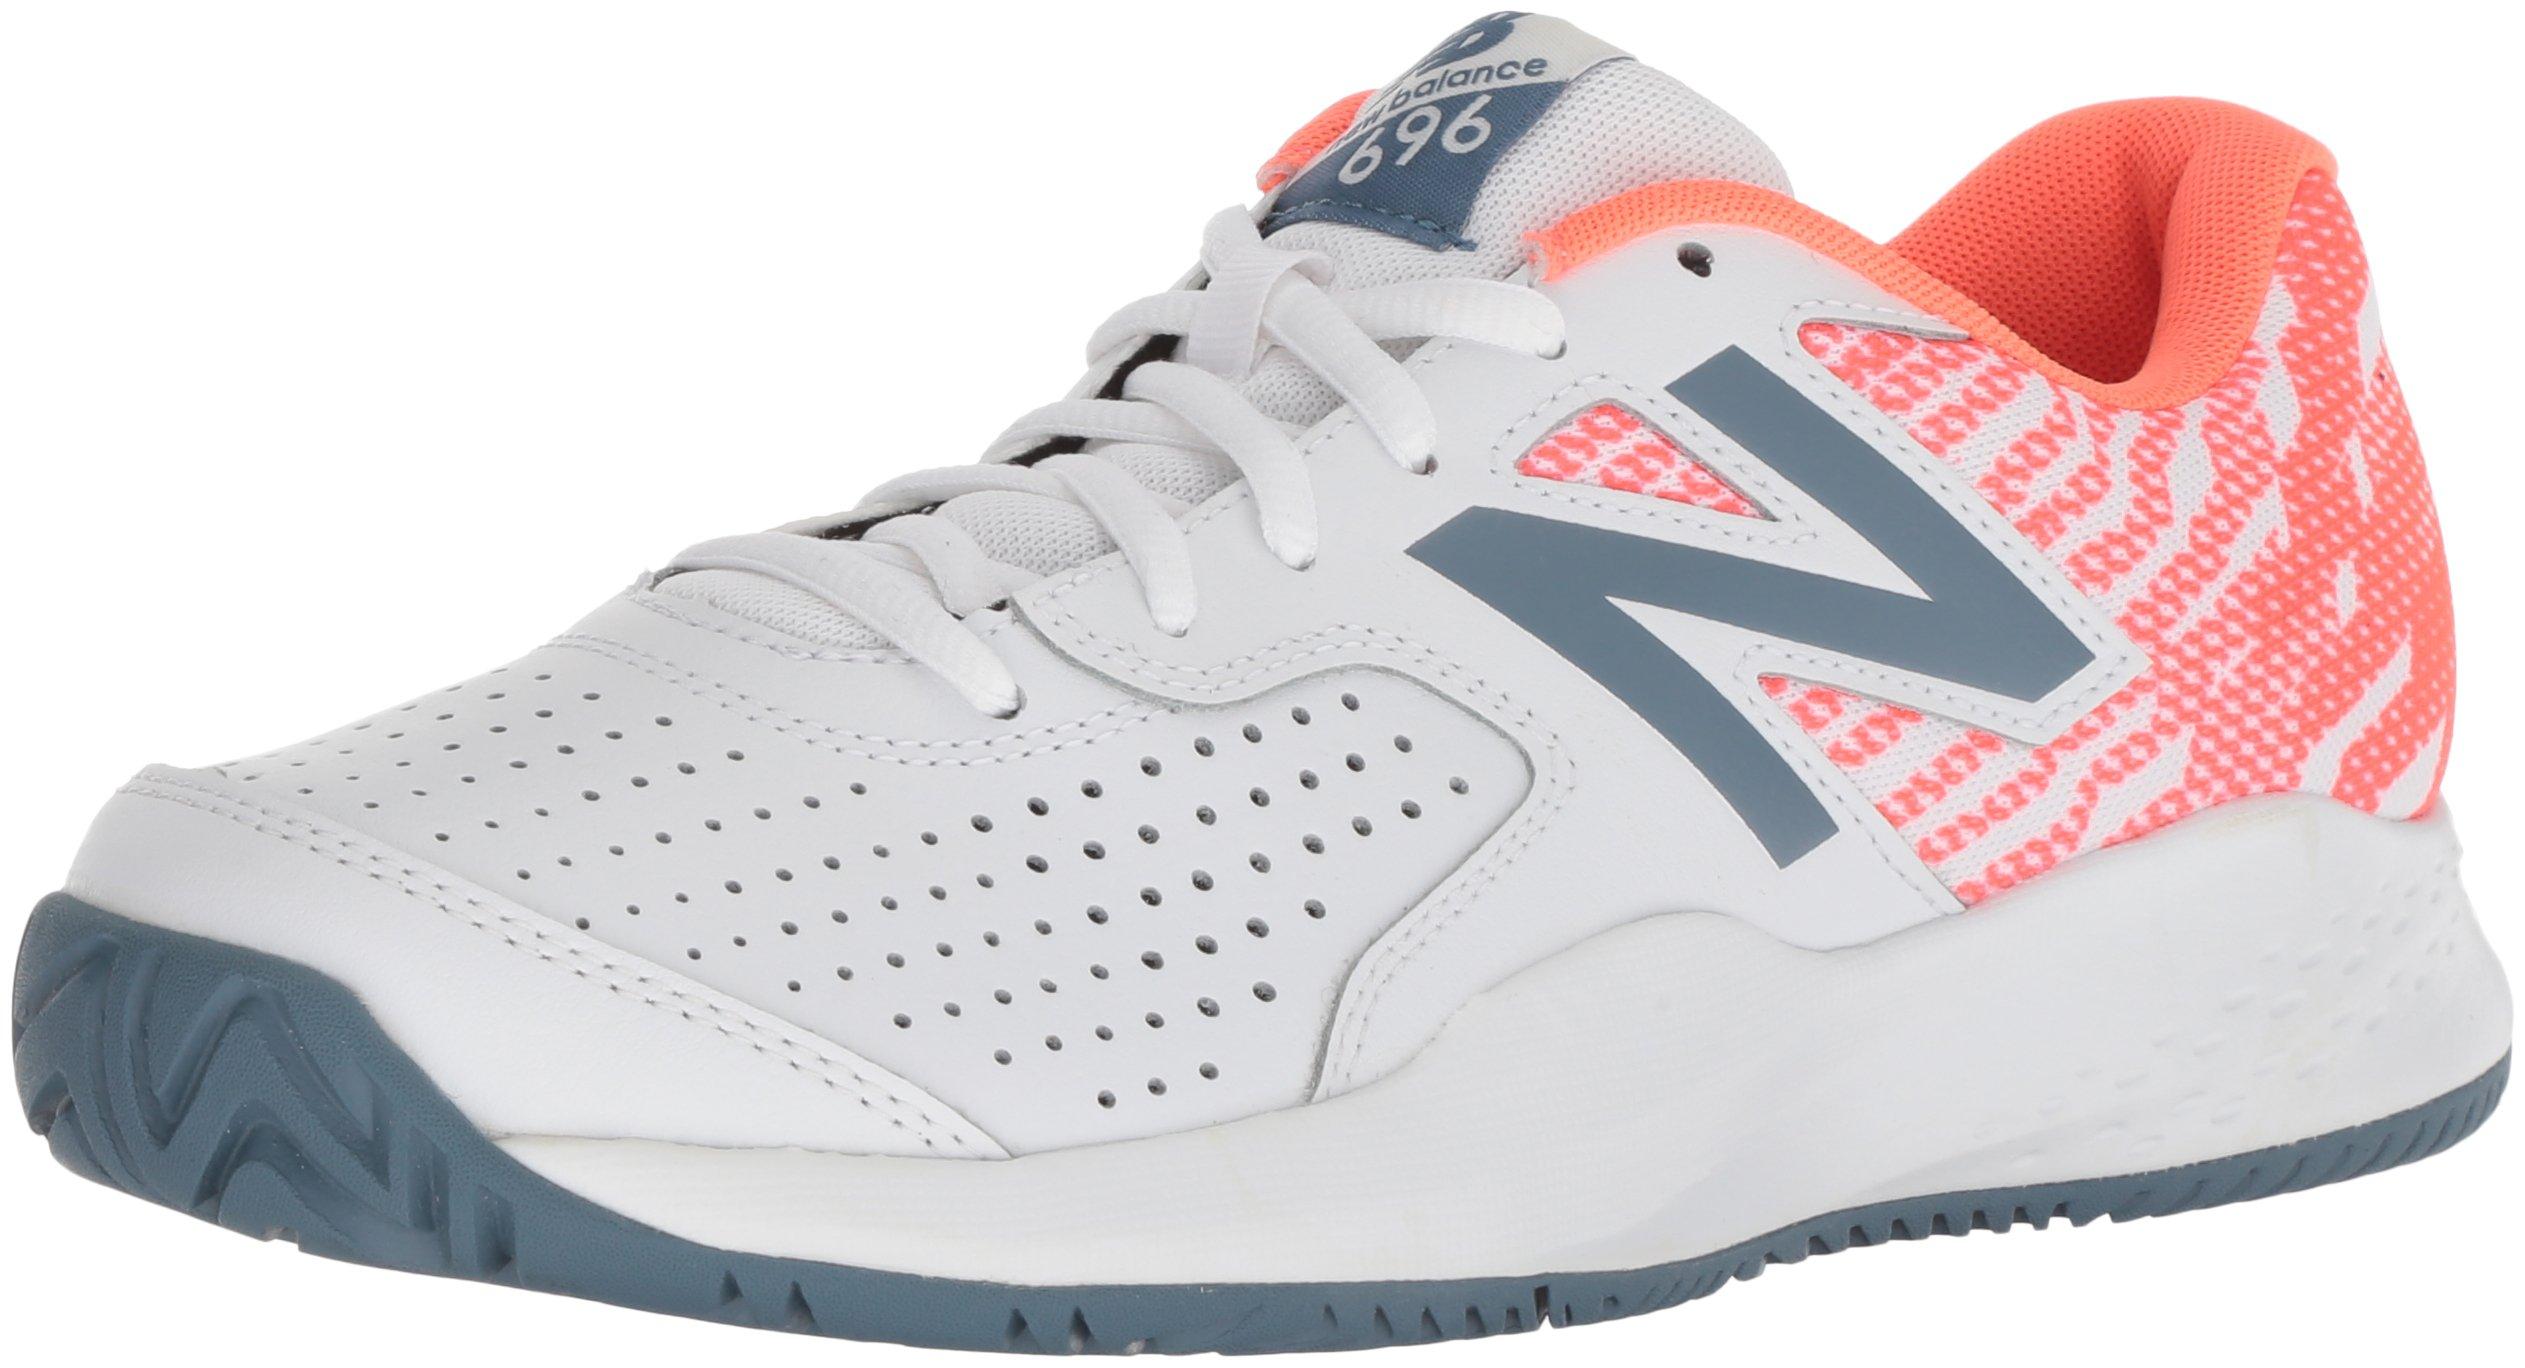 New Balance 696v3, Zapatillas de Tenis para Mujer product image